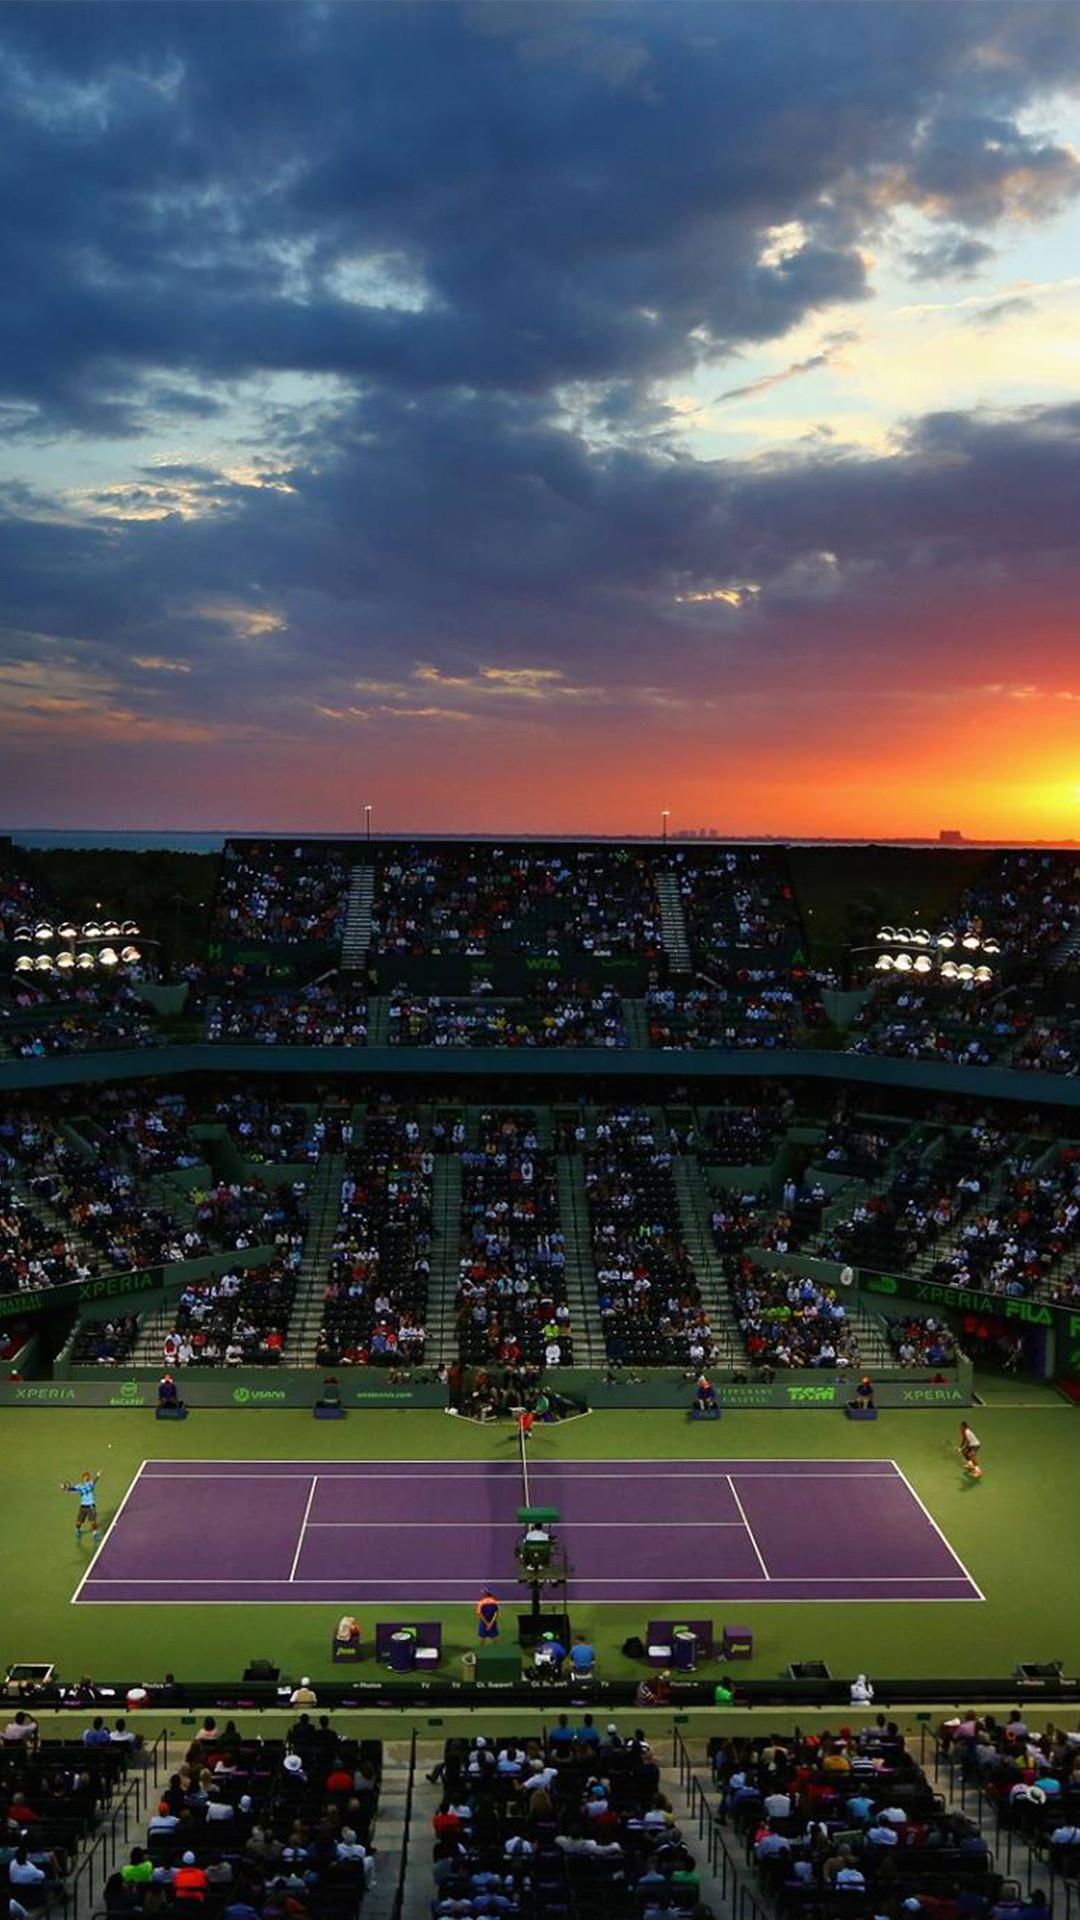 Miami Open Tennis Court Sunset iPhone 7+ HD Wallpaper